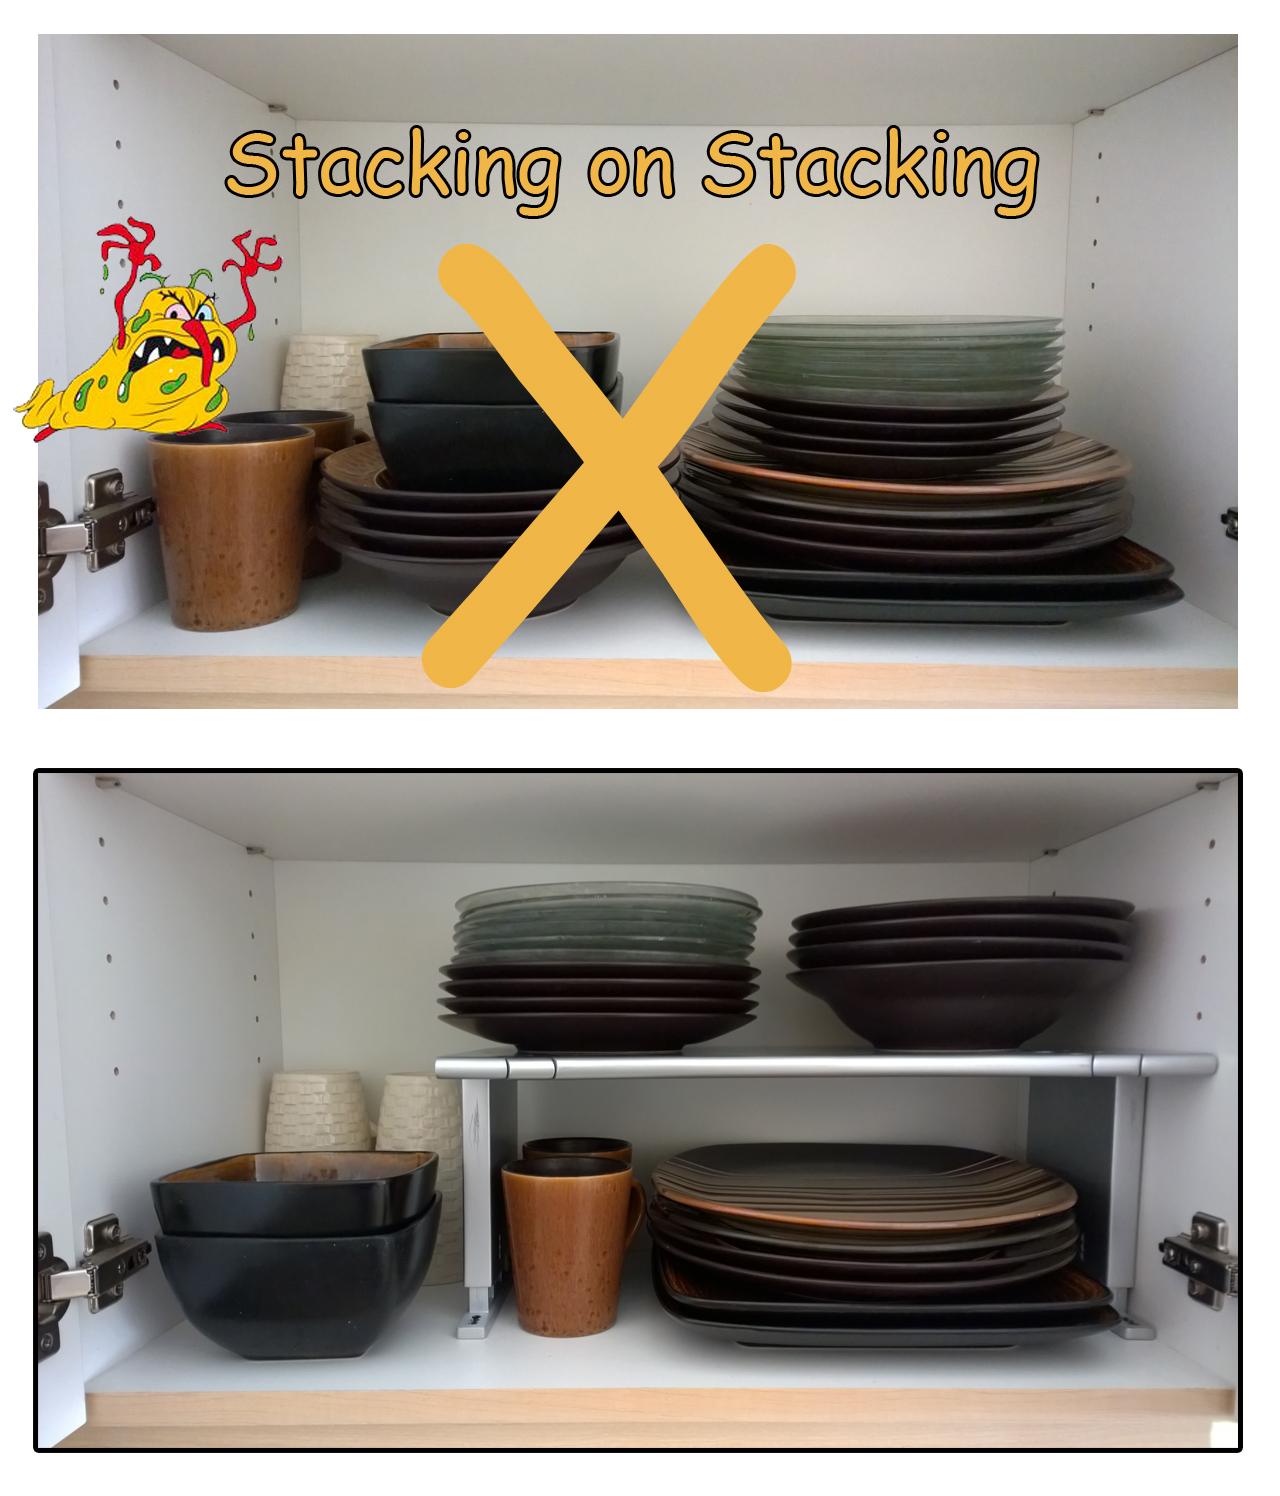 Shelf Lower and Wider